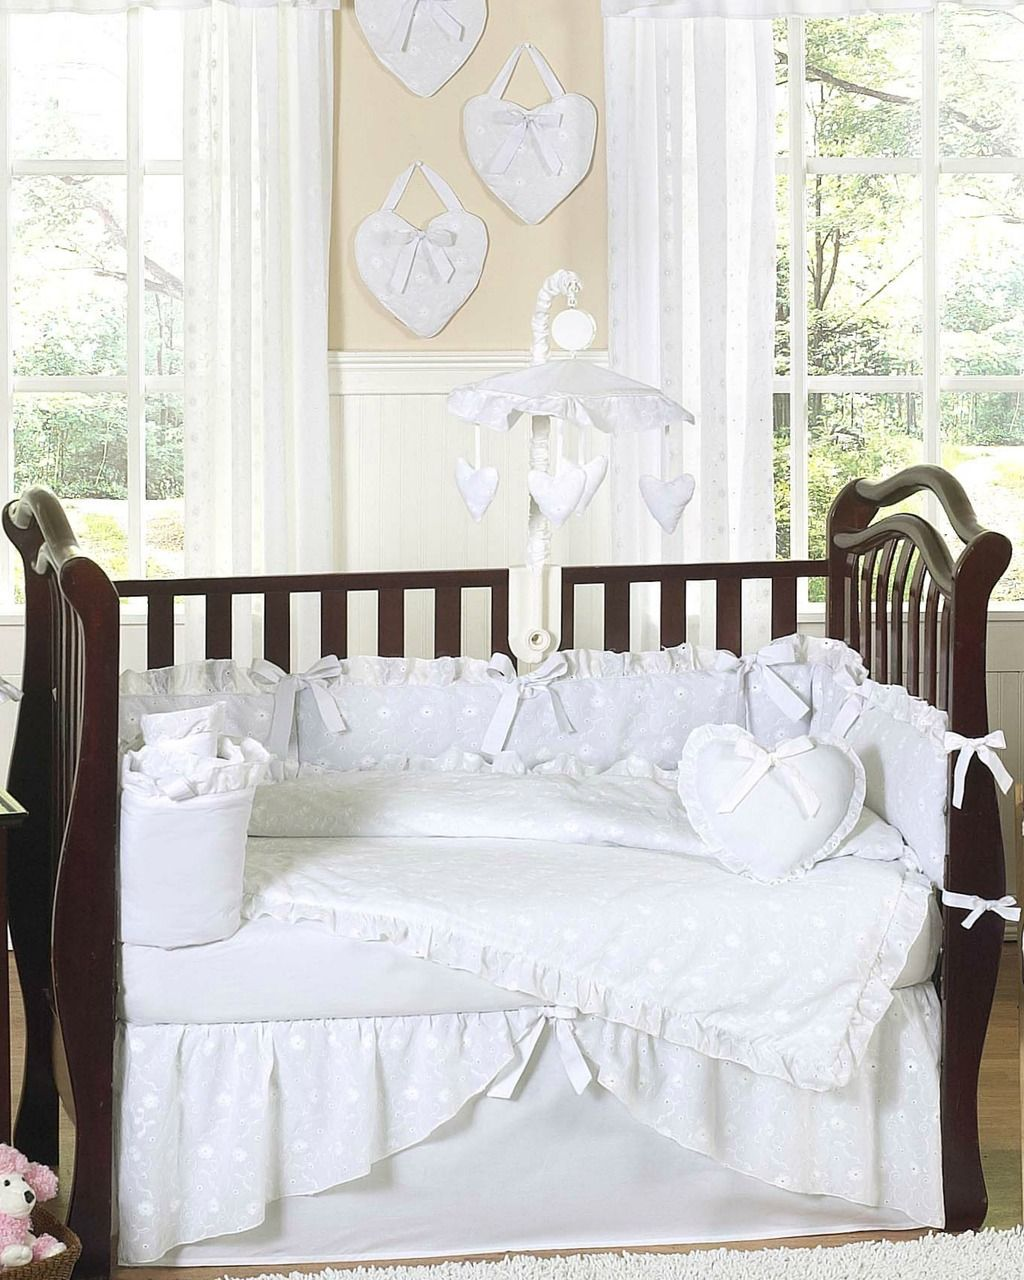 Eyelet White Crib Bedding 9 Piece Set